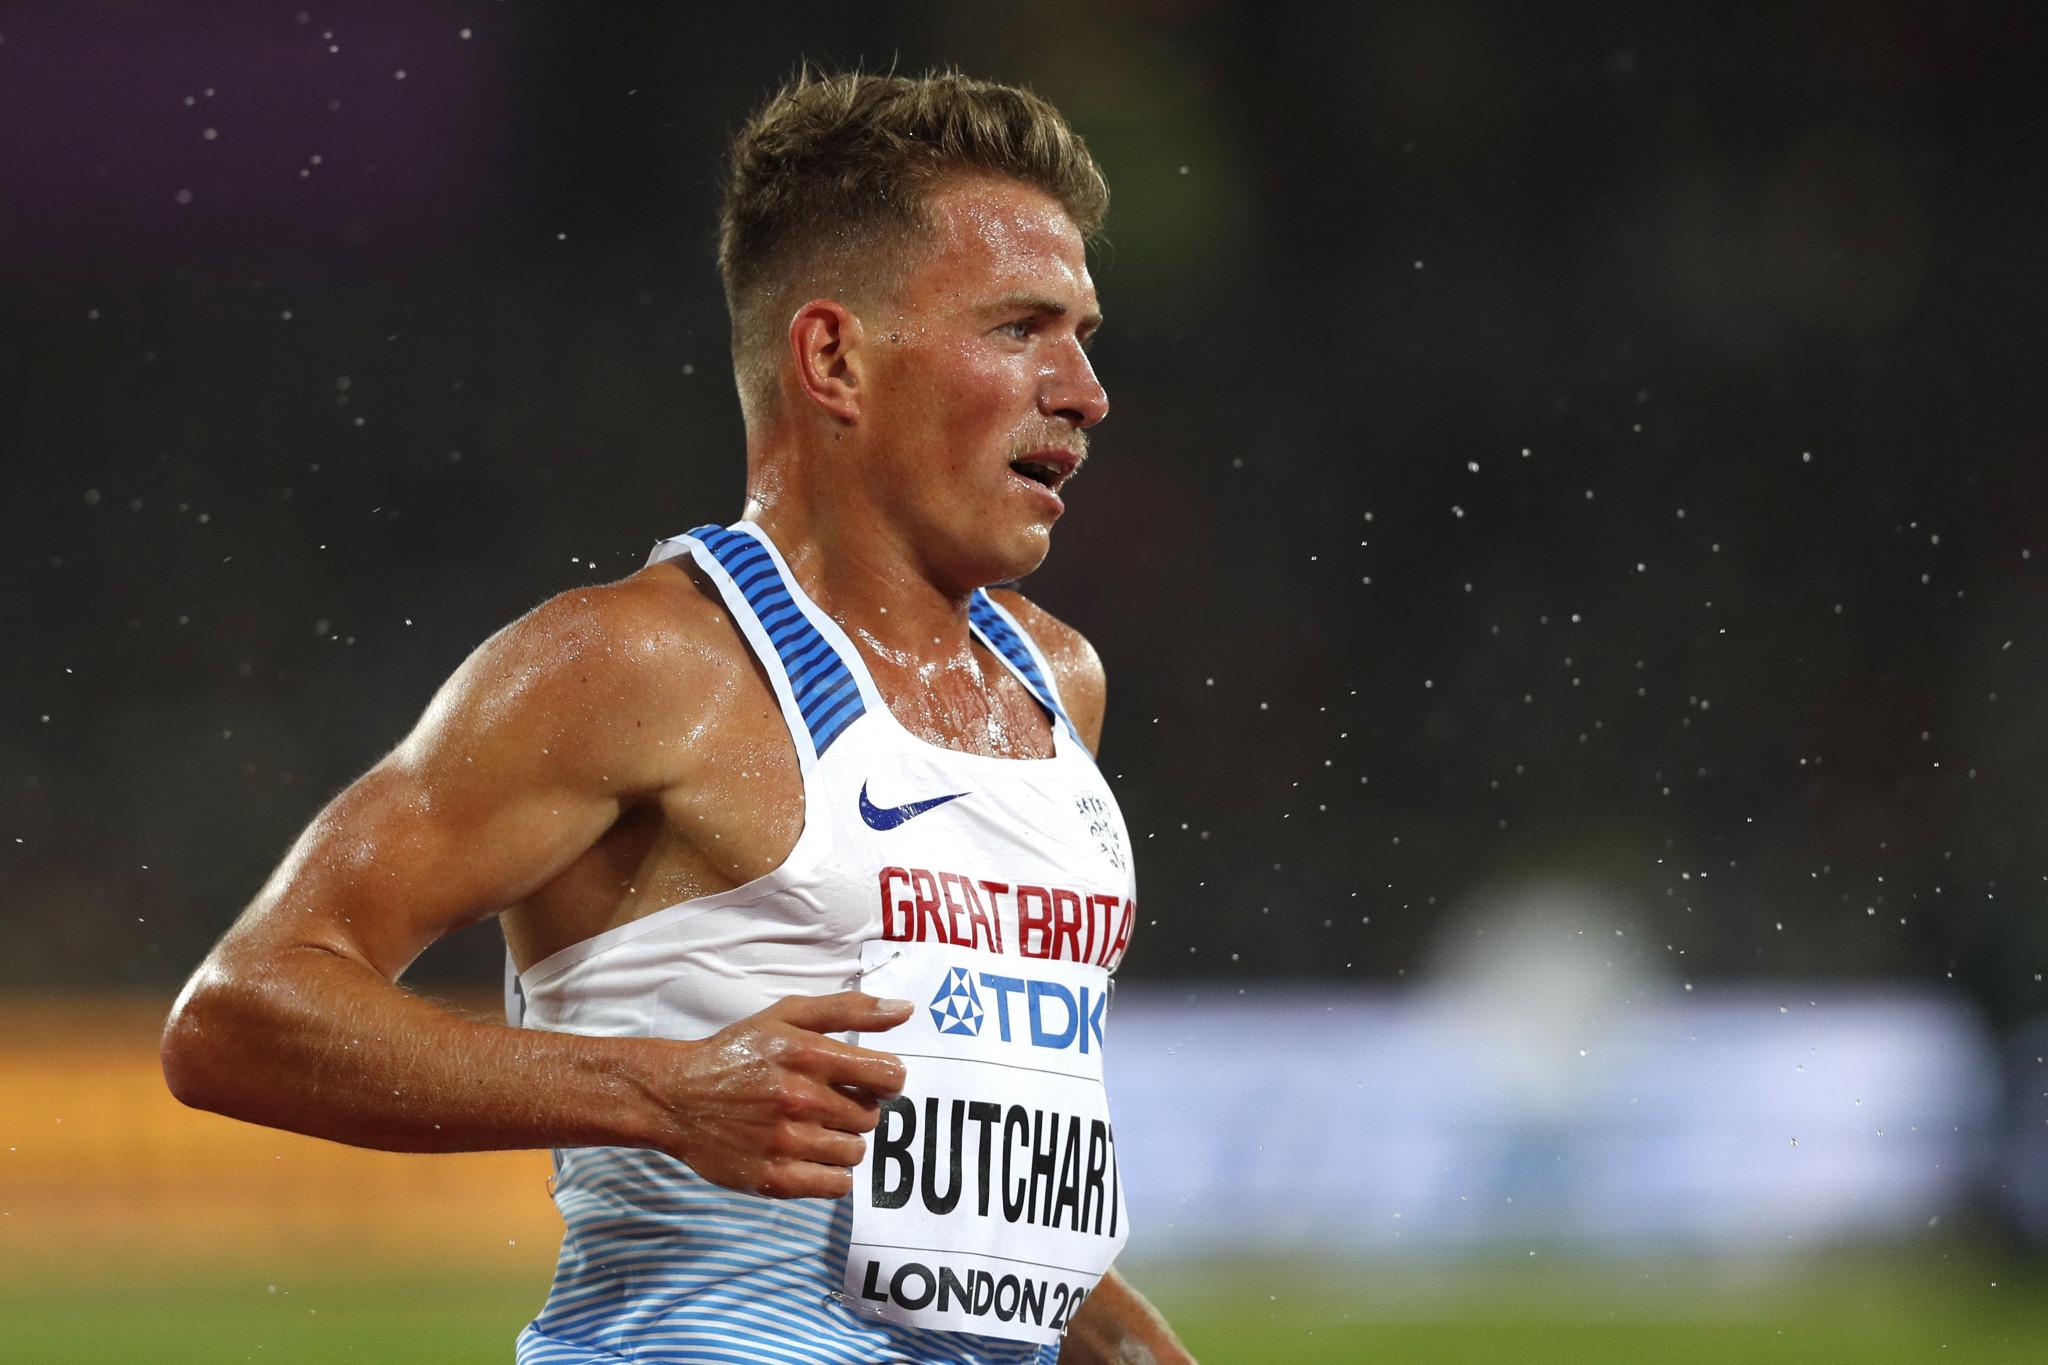 Scotland suffer Gold Coast 2018 athletics blow